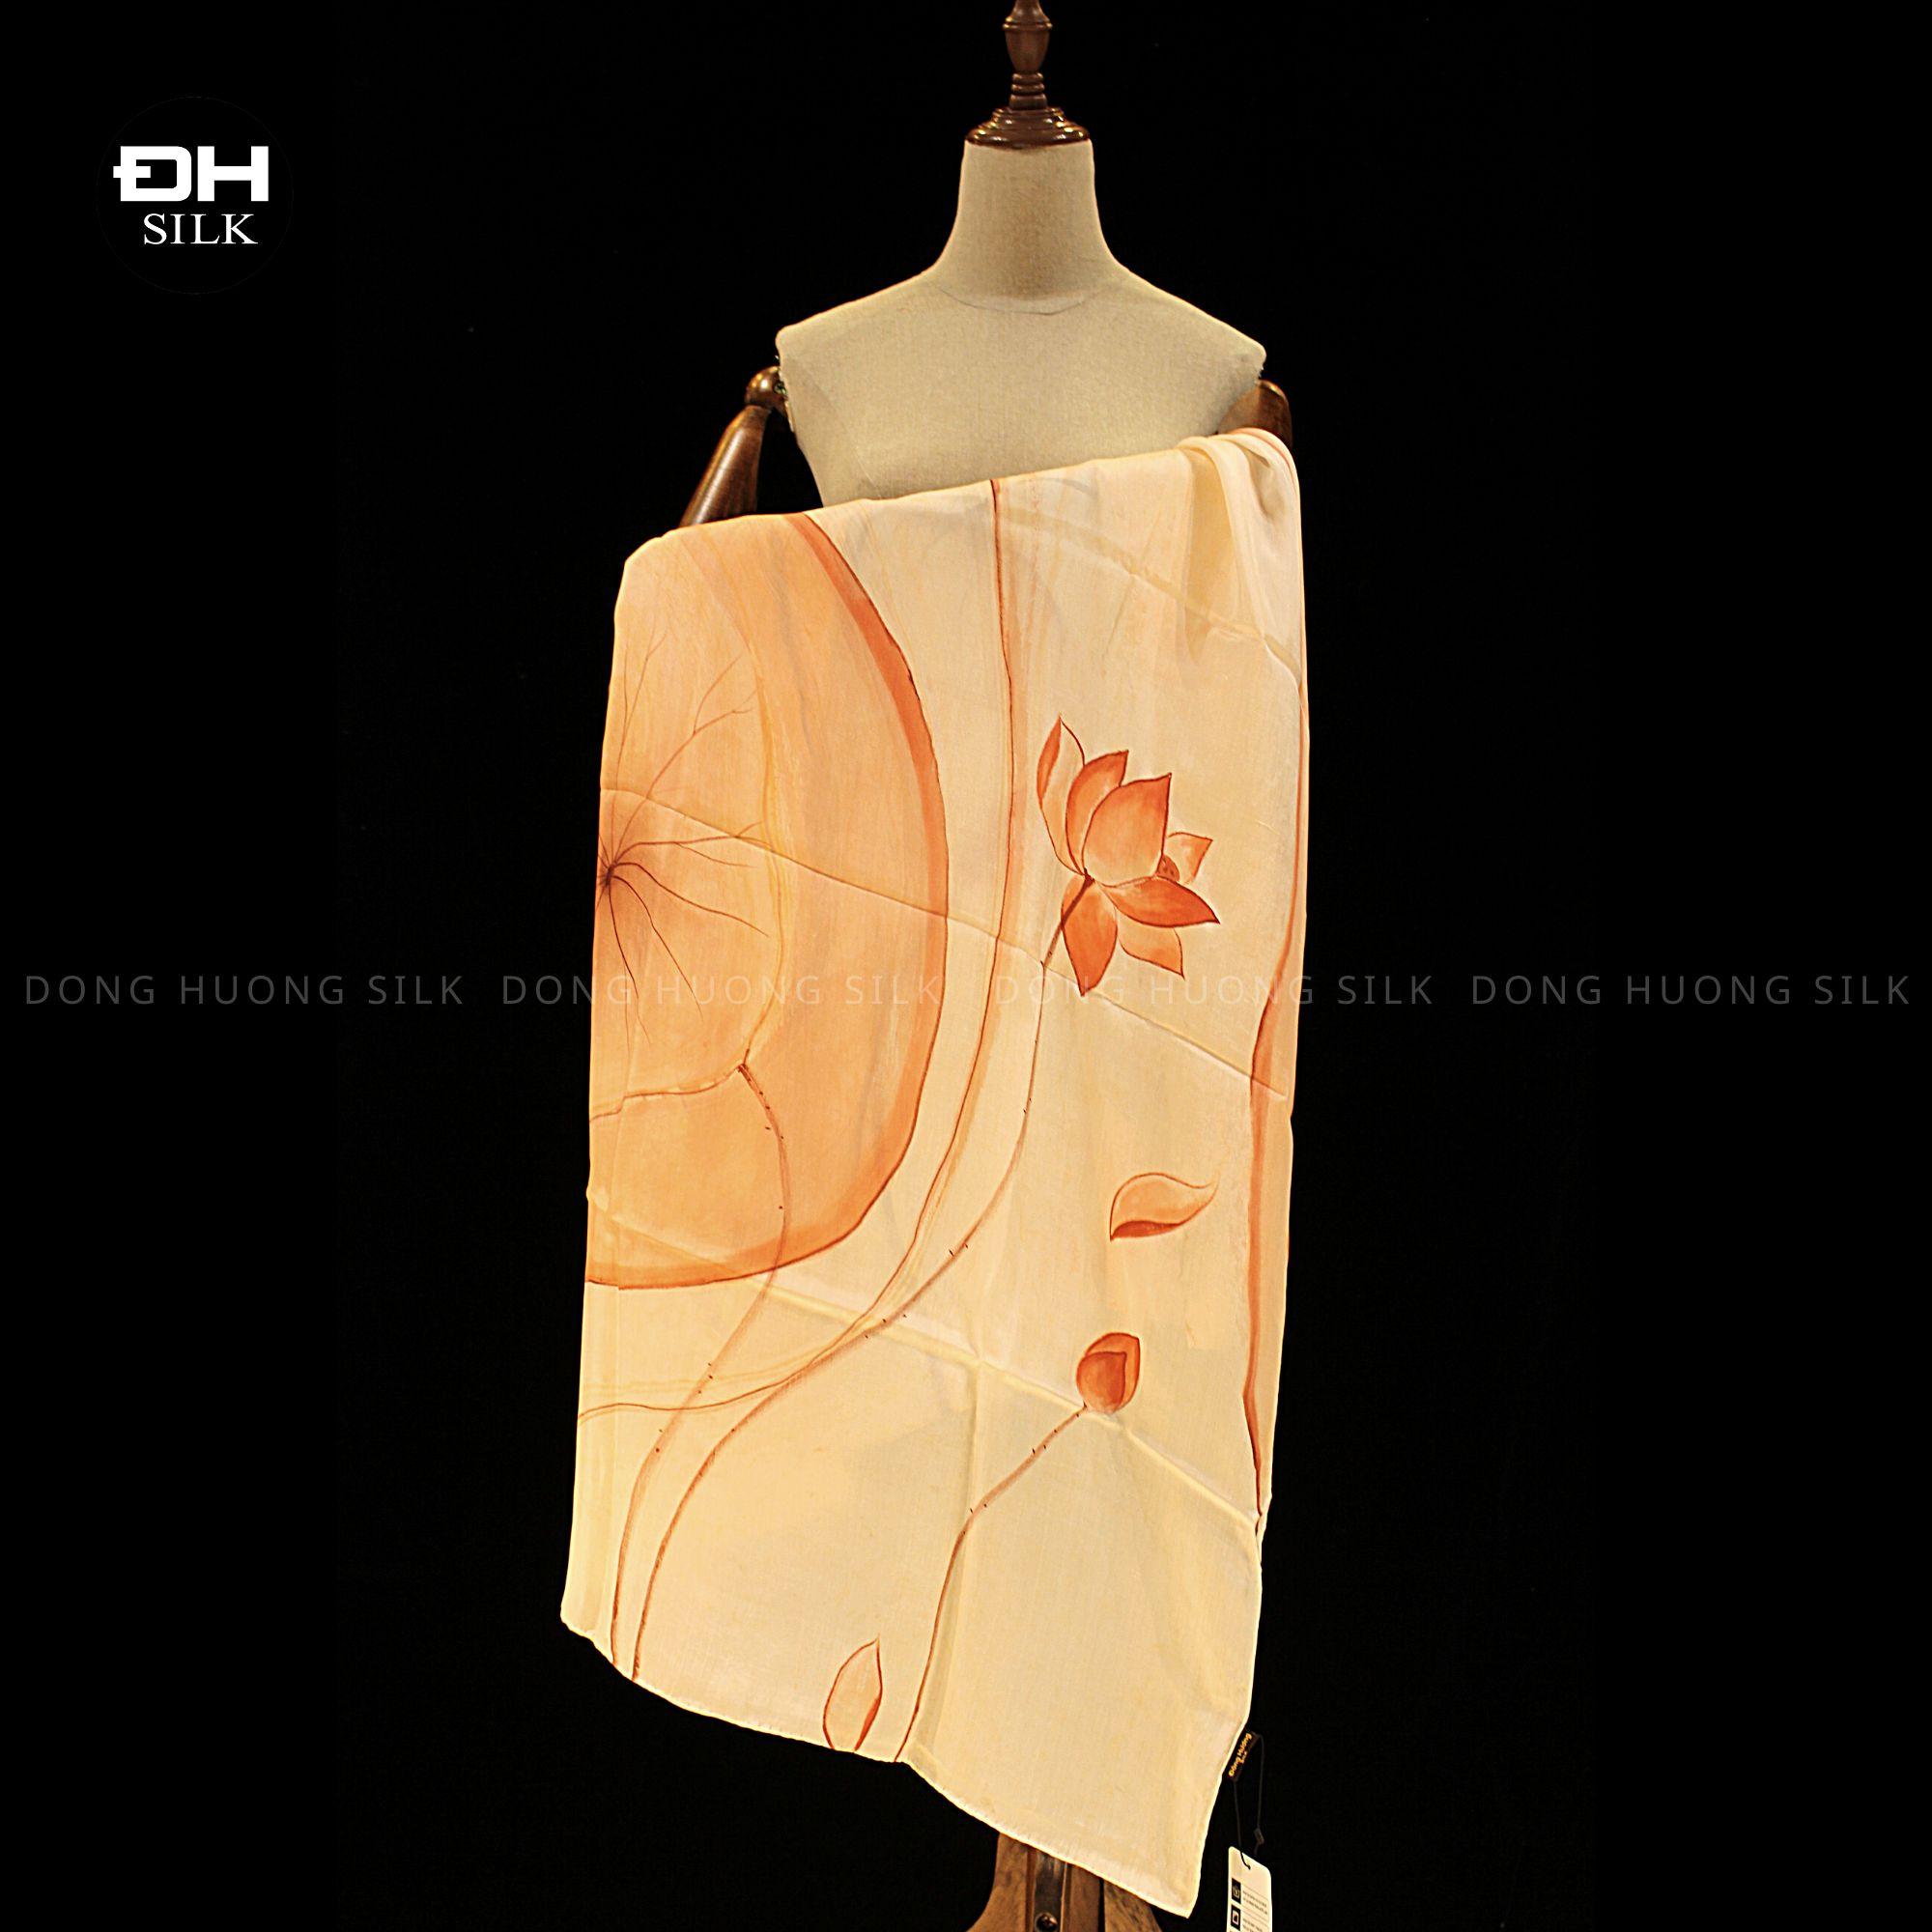 khan-lua-to-tam-ve-tay-thuy-an-nghe-thuat-hoa-sen-vinh-cuu-Dong-Huong-Silk-6